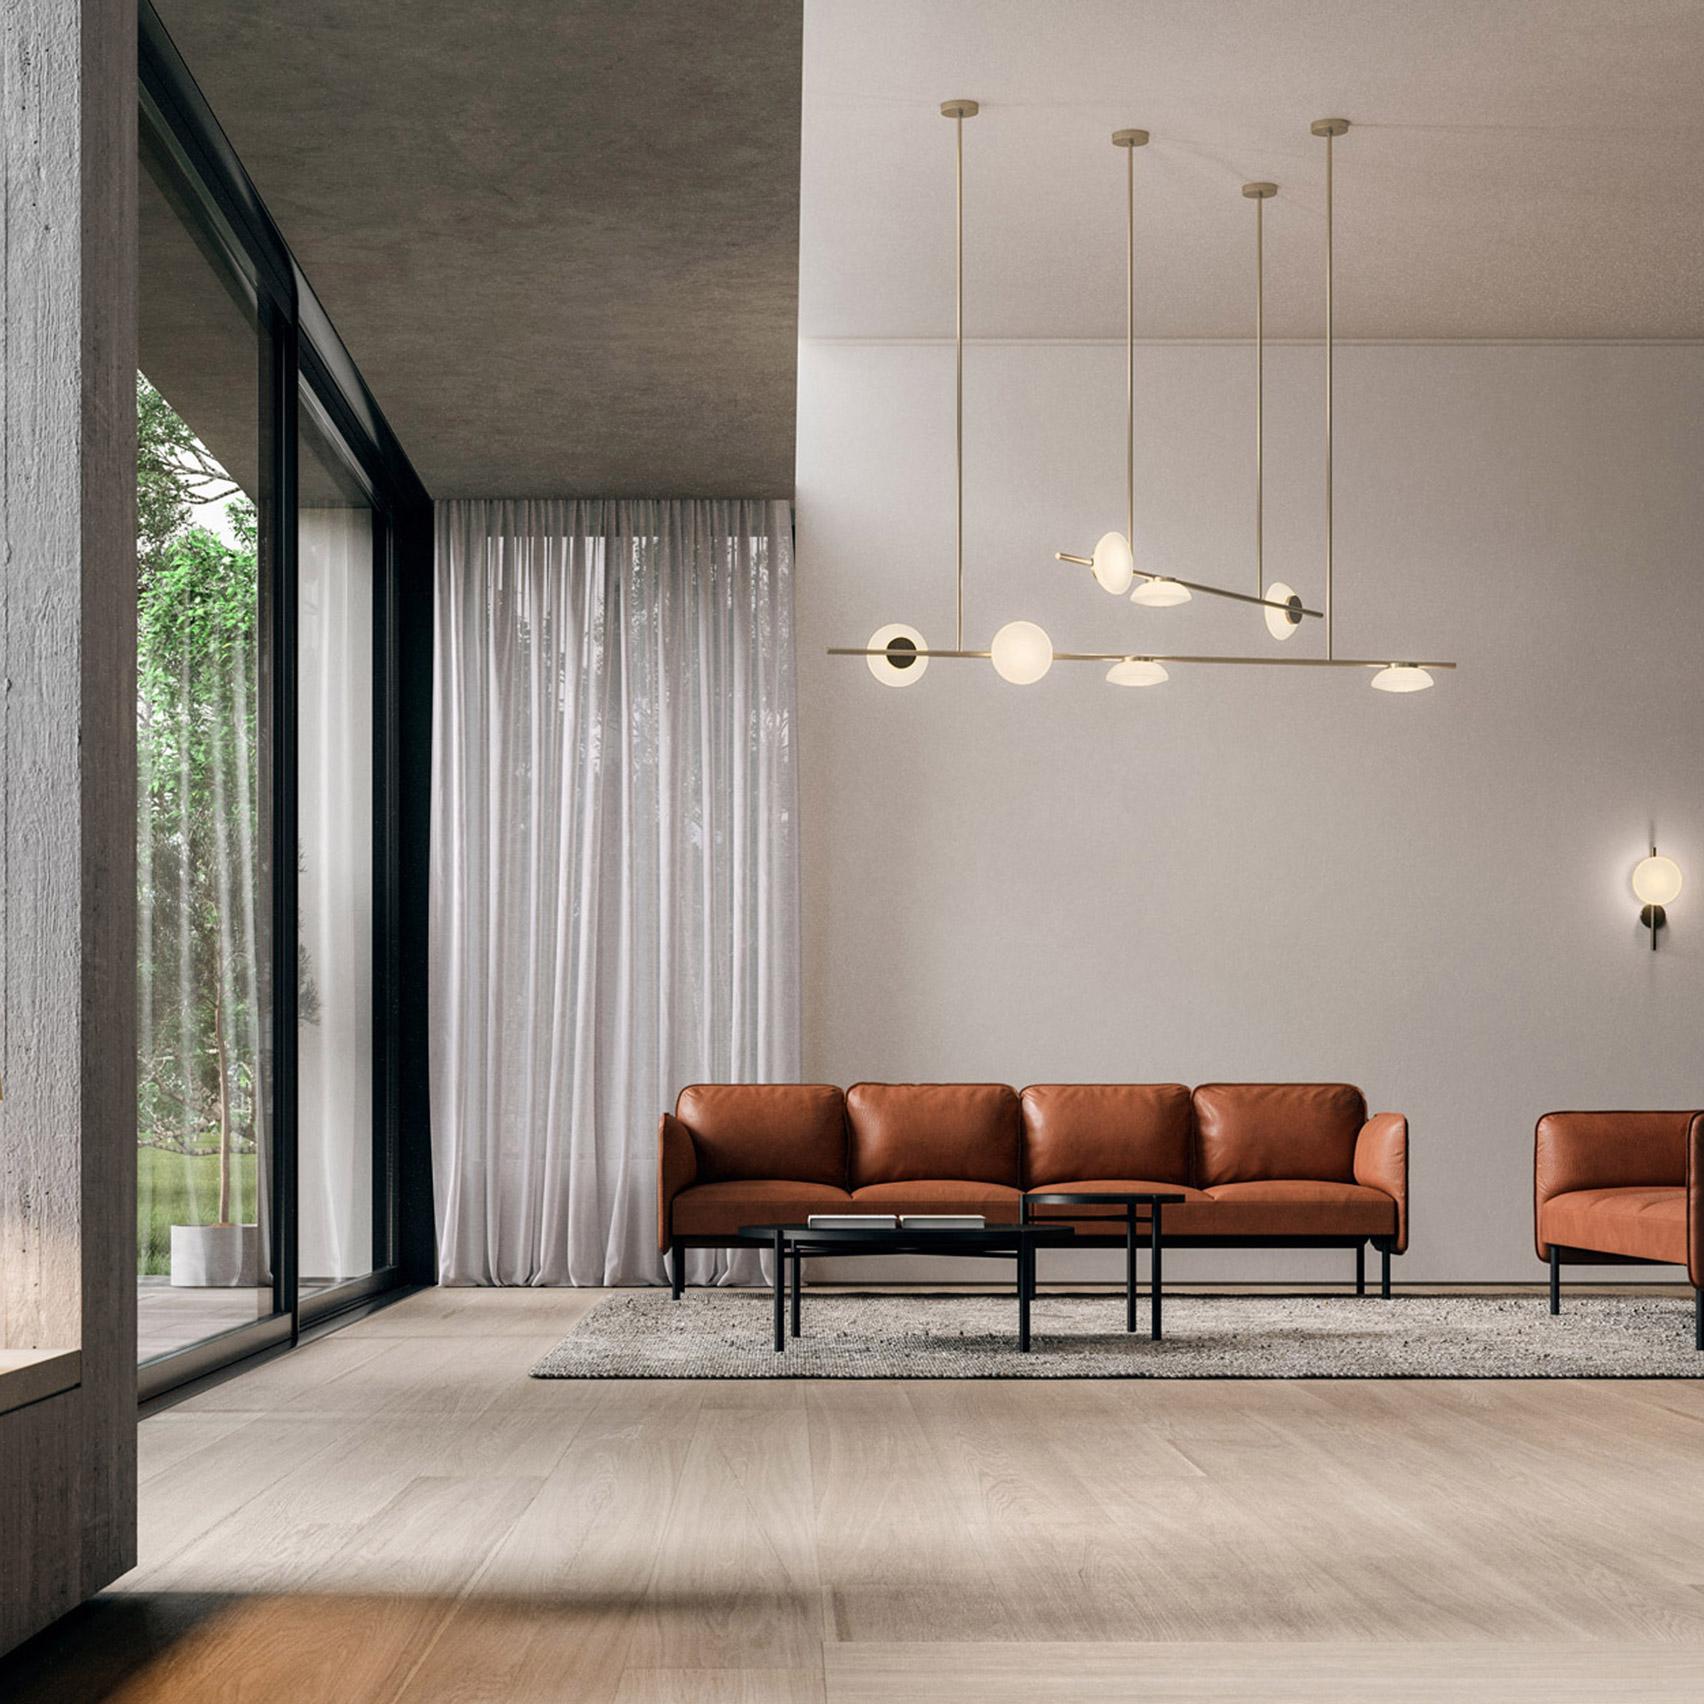 Ceto horizontal chandelier by Ross Gardam